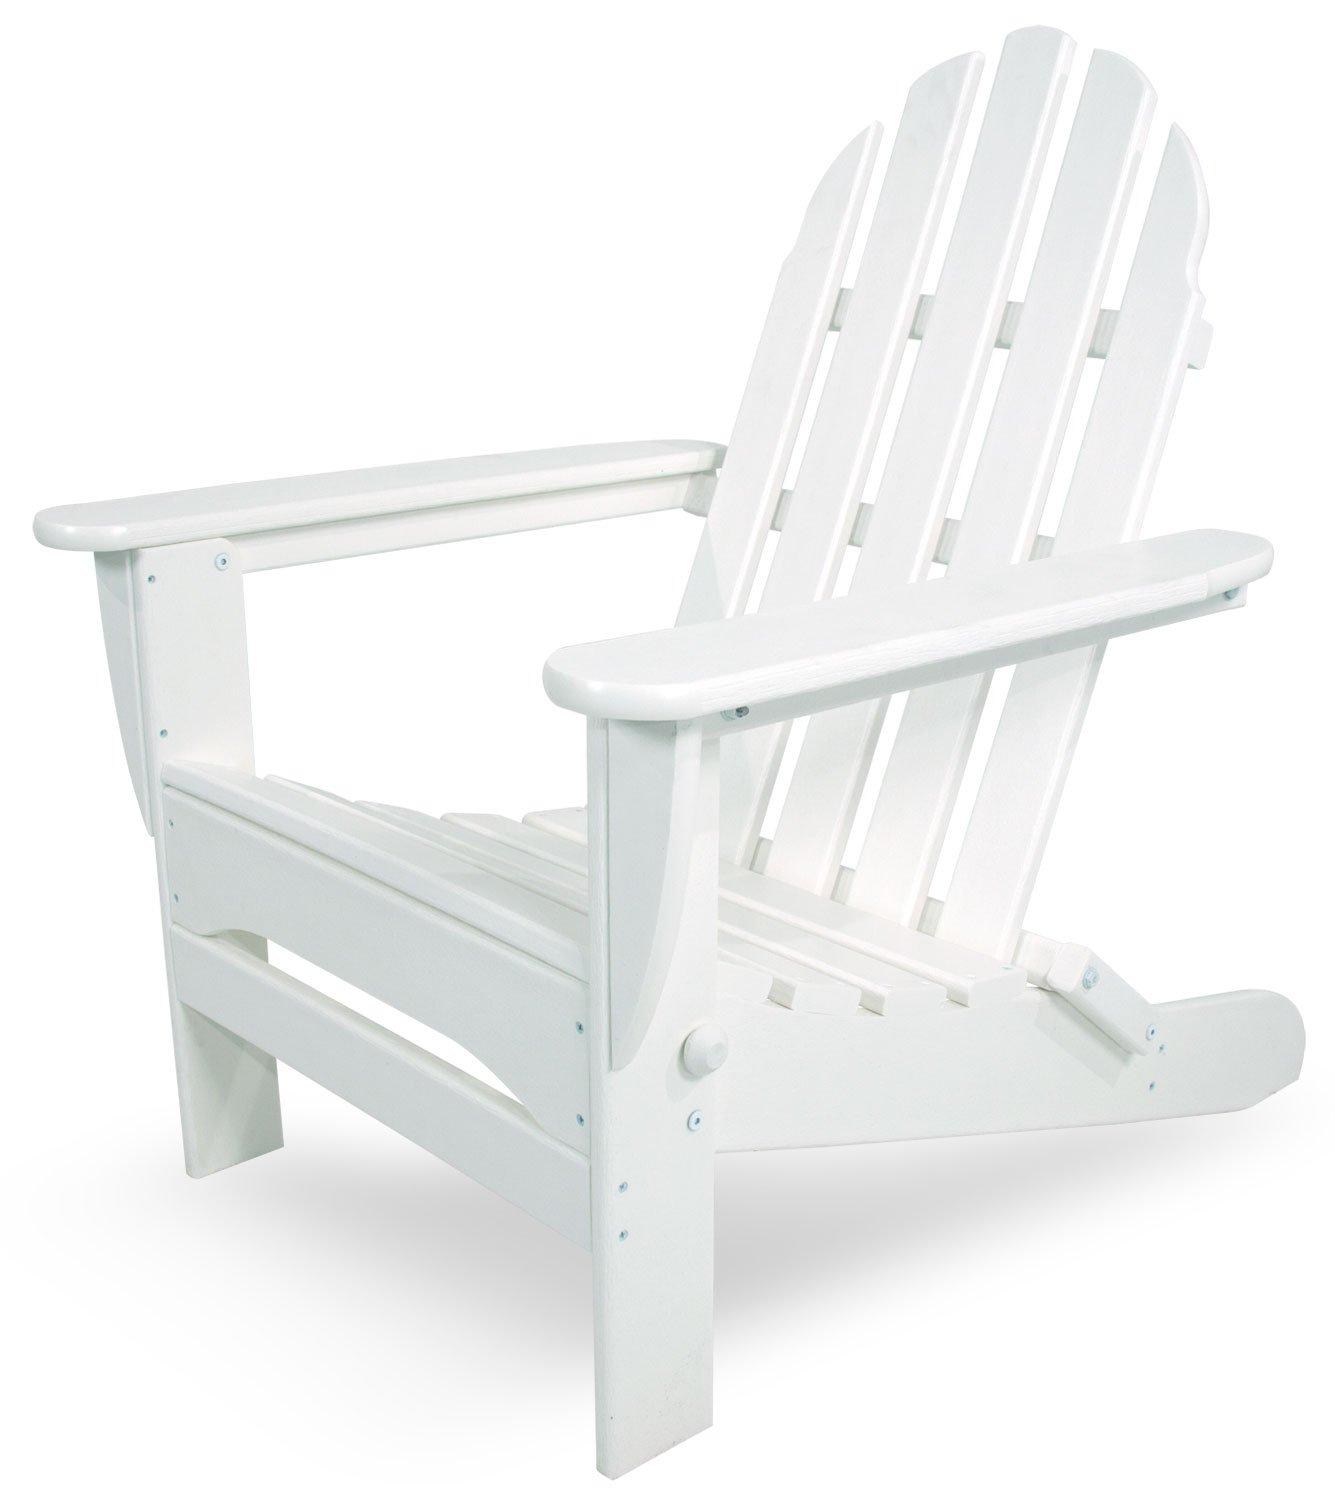 POLYWOOD AD5030WH Classic Folding Adirondack Chair, 35.00'' x 29'' x 35.00'', White